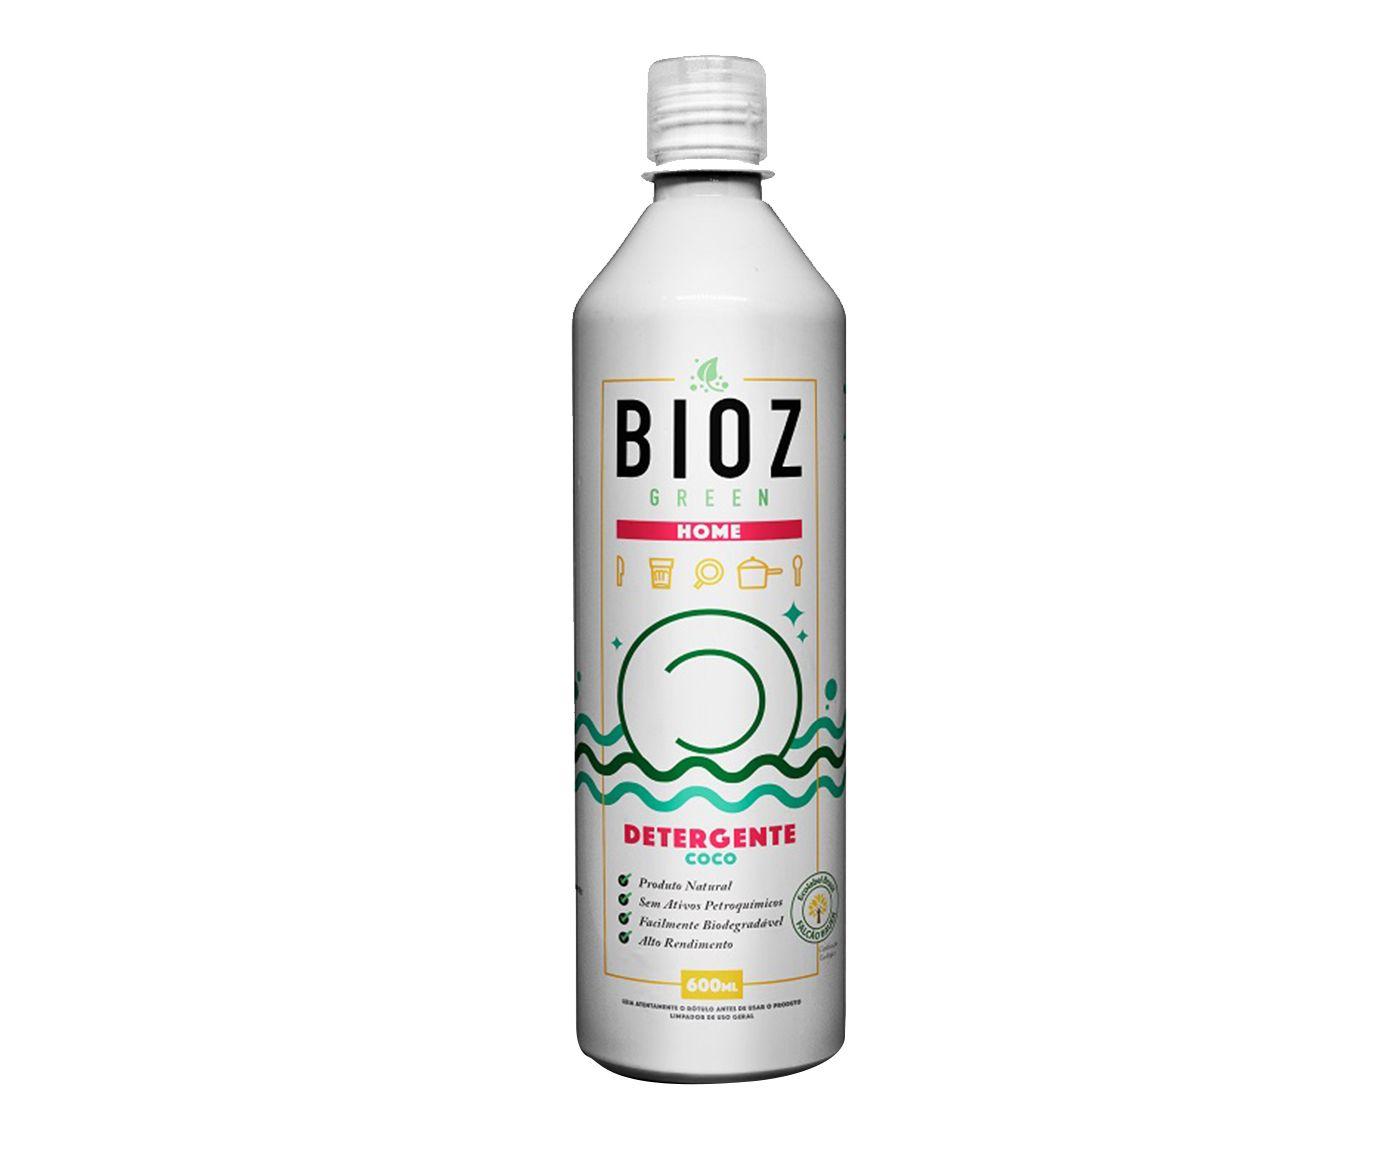 Detergente Coco Bioz - 600ml | Westwing.com.br